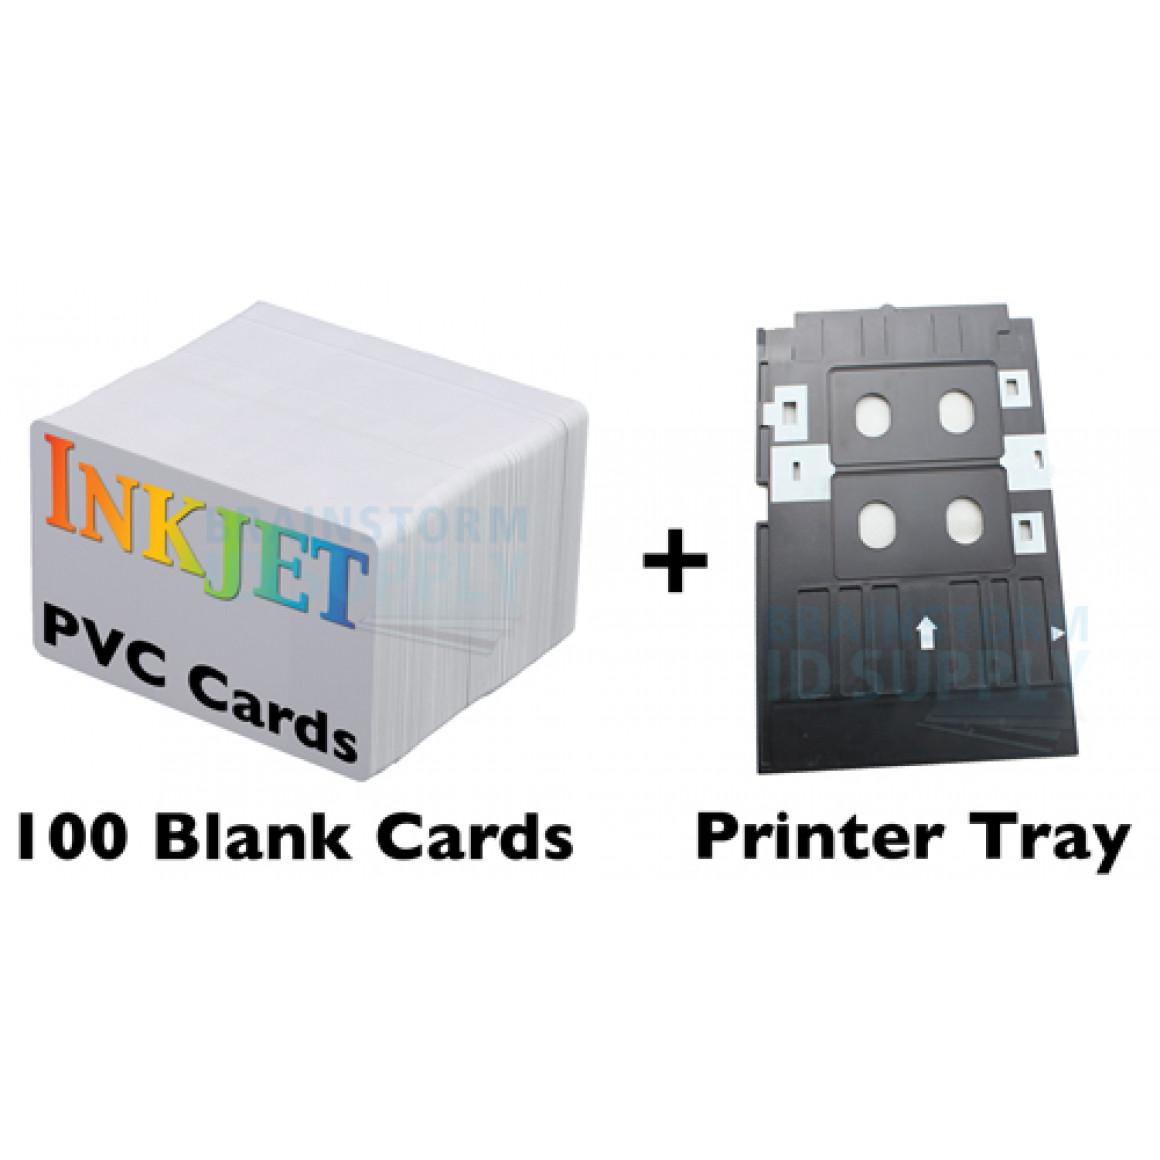 Inkjet PVC Card Assistant - Brainstorm ID